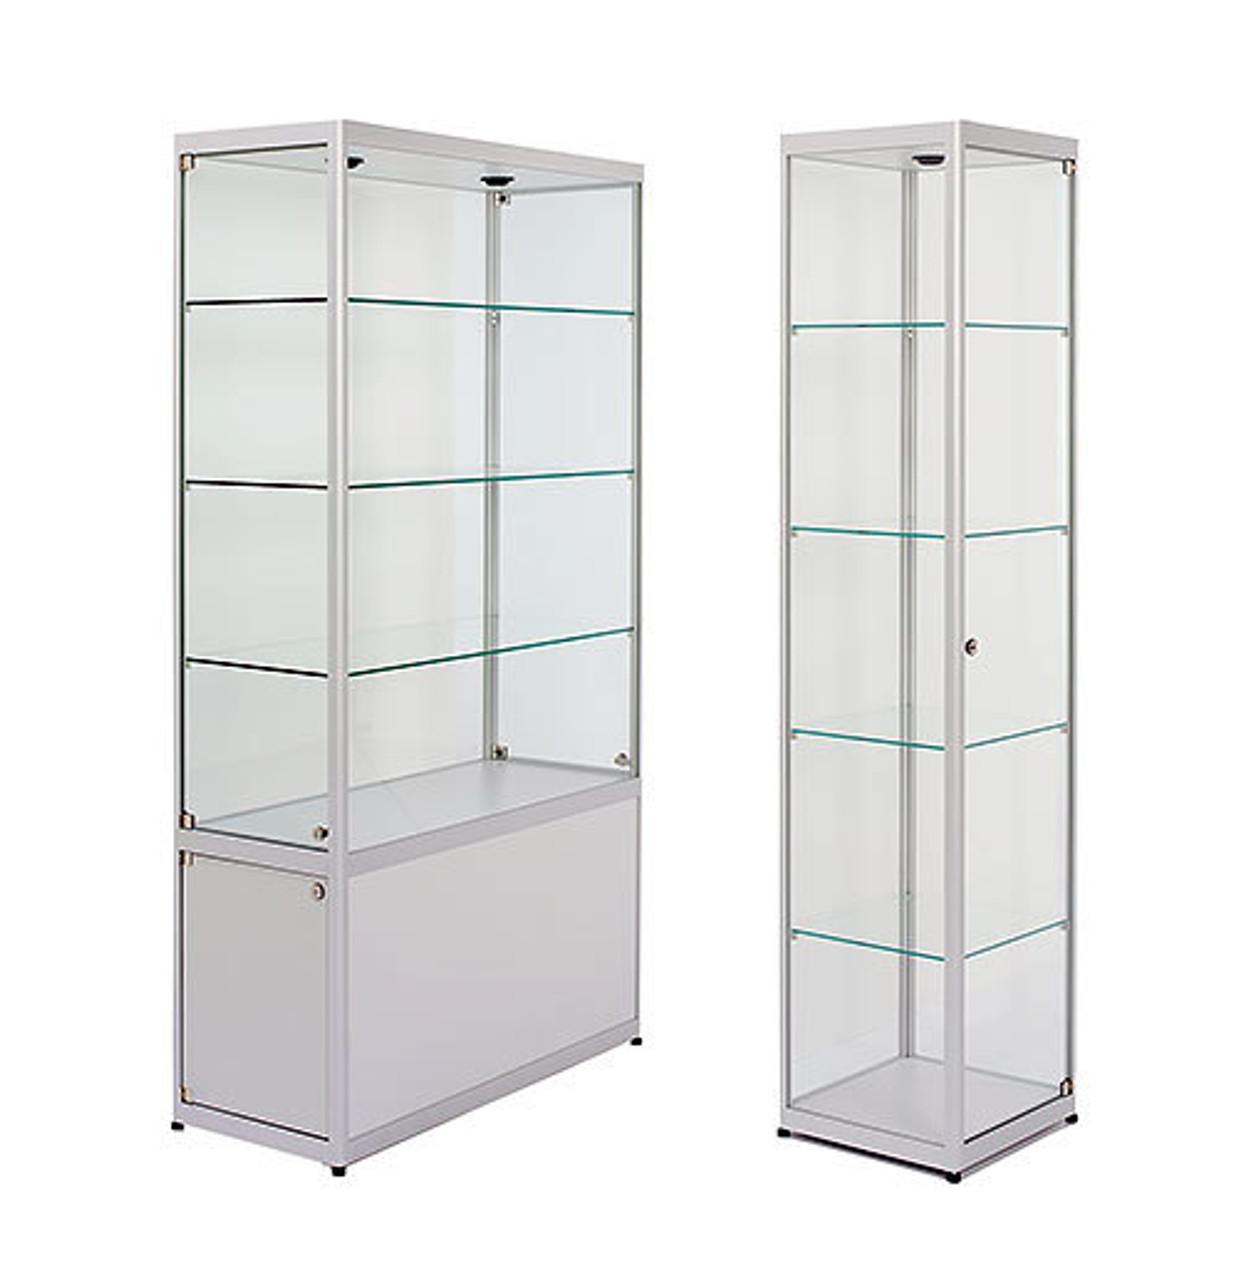 Magnuson Display Cases